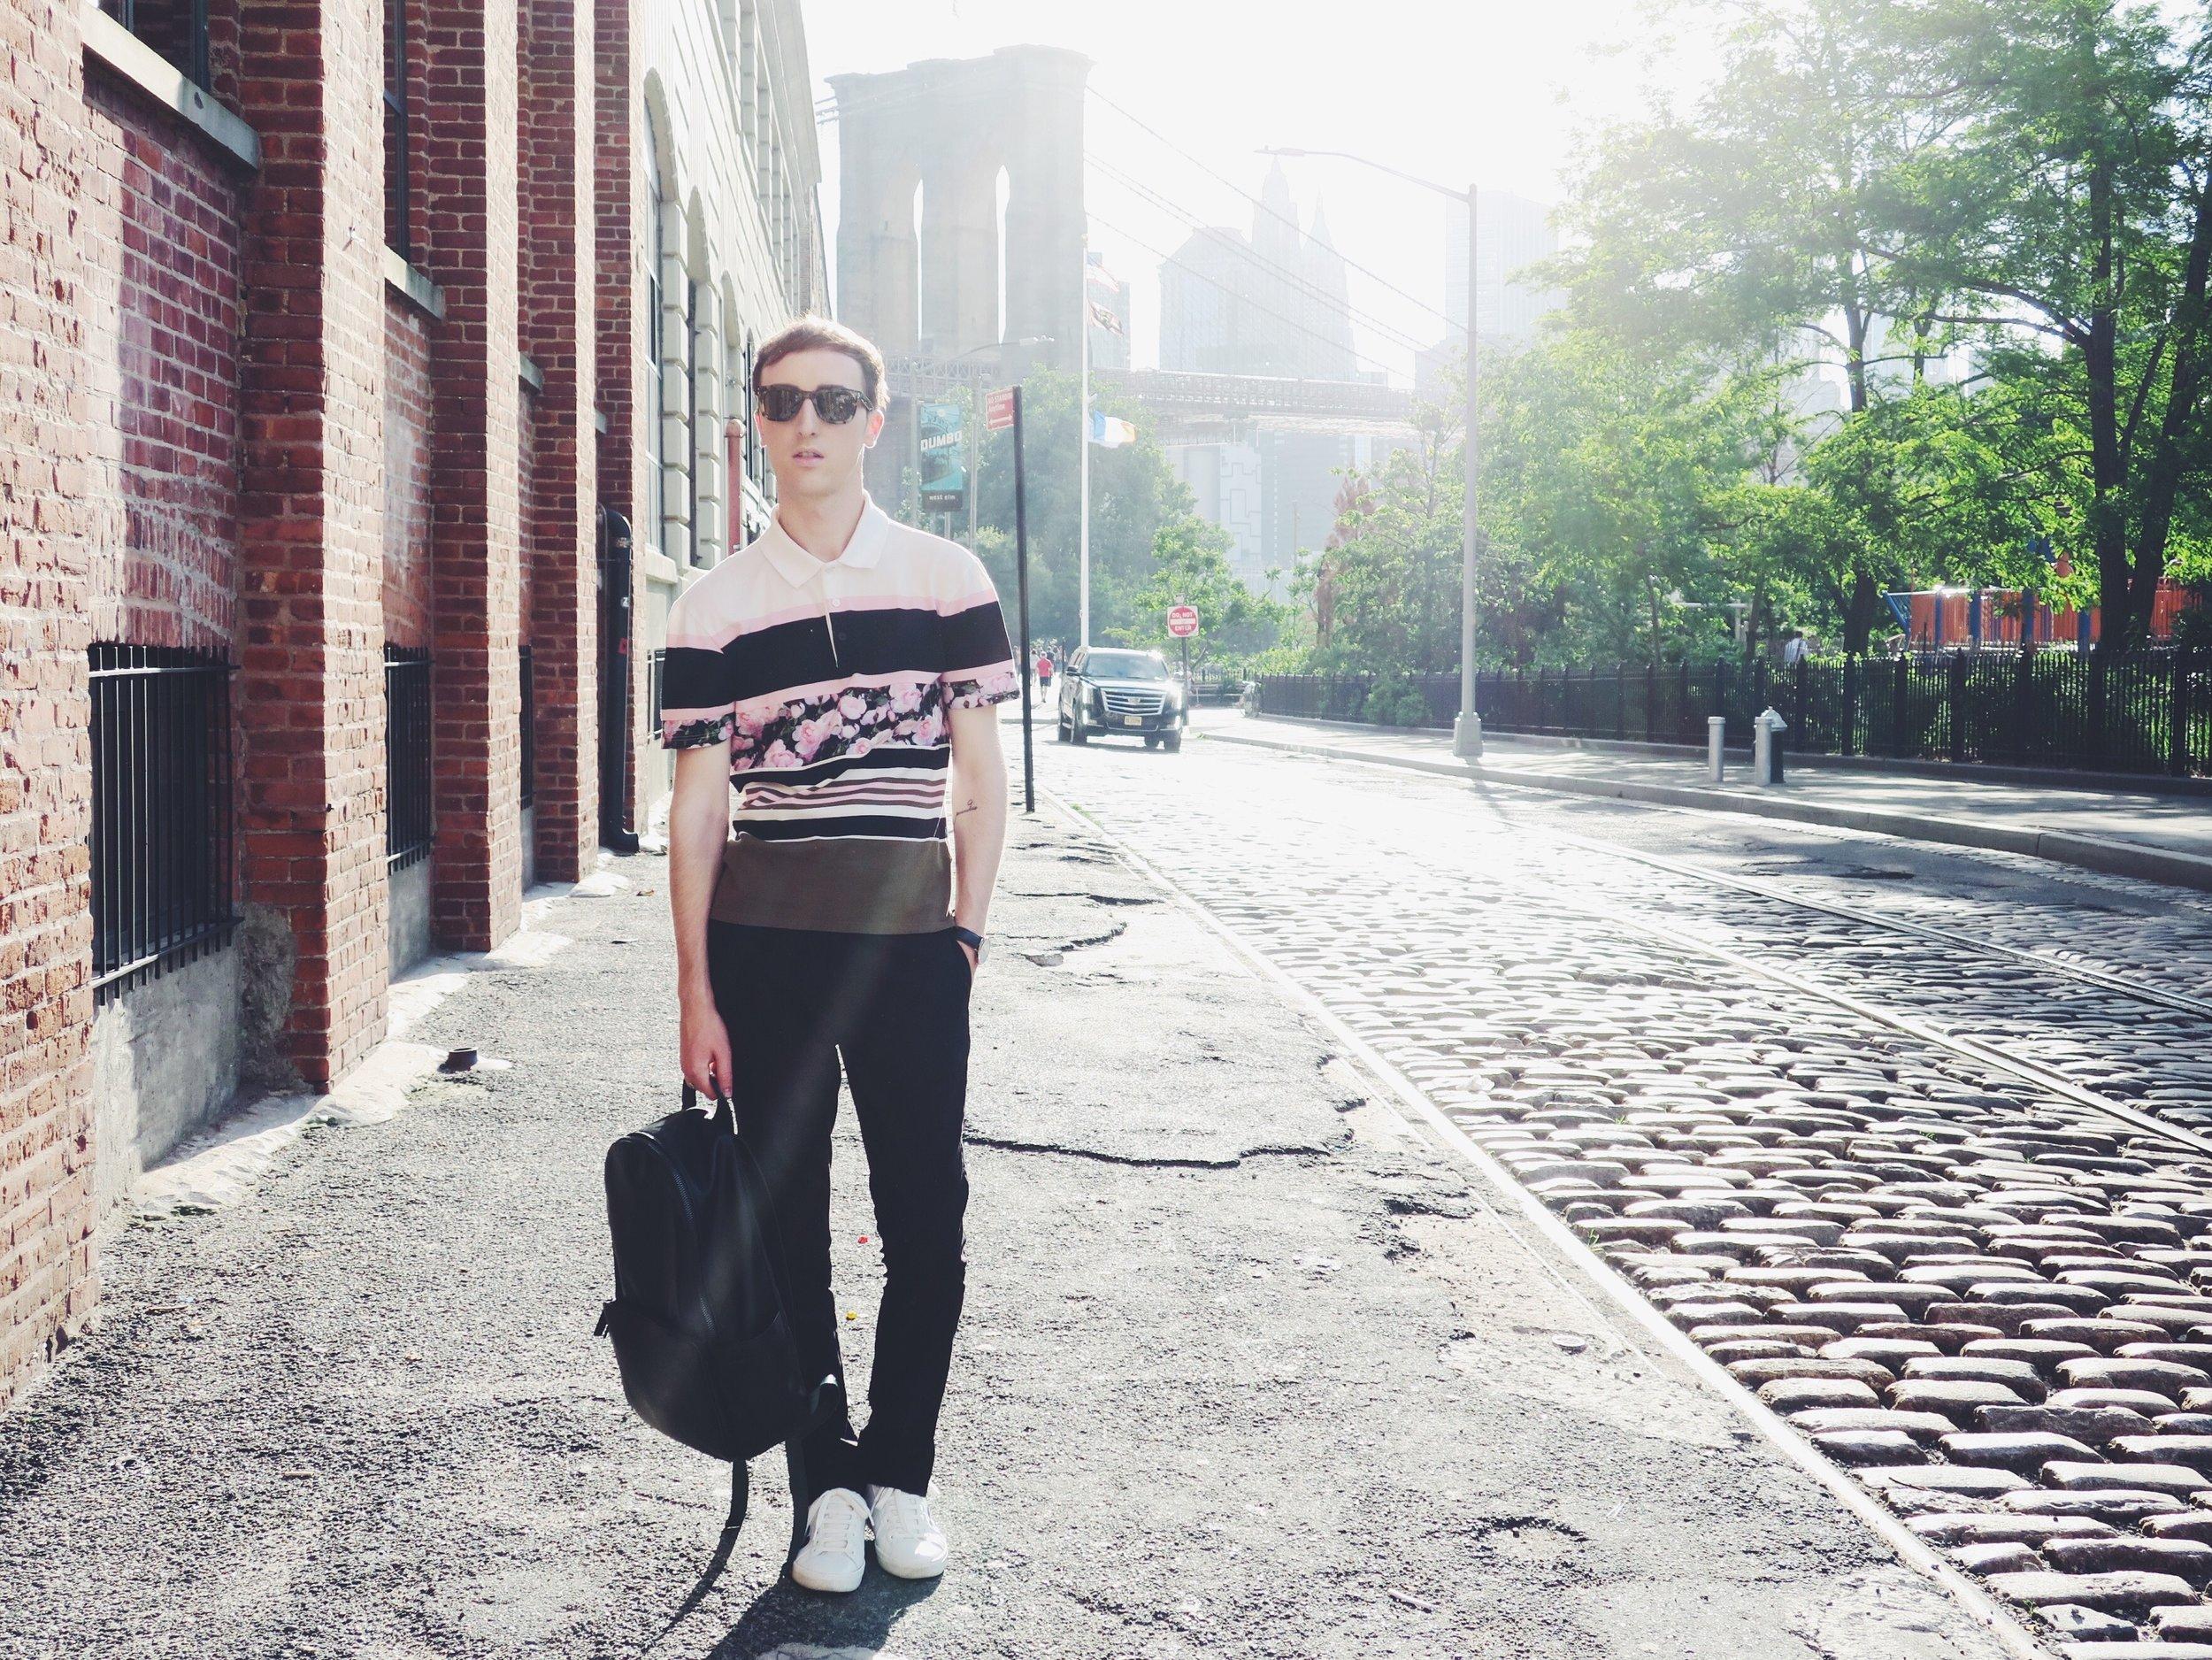 Givenchy polo shirt - H&M Studio trousers - Zara sneakers - Komono sunglasses - Zara backpack New York, you really got me 'Carrie-d' away!